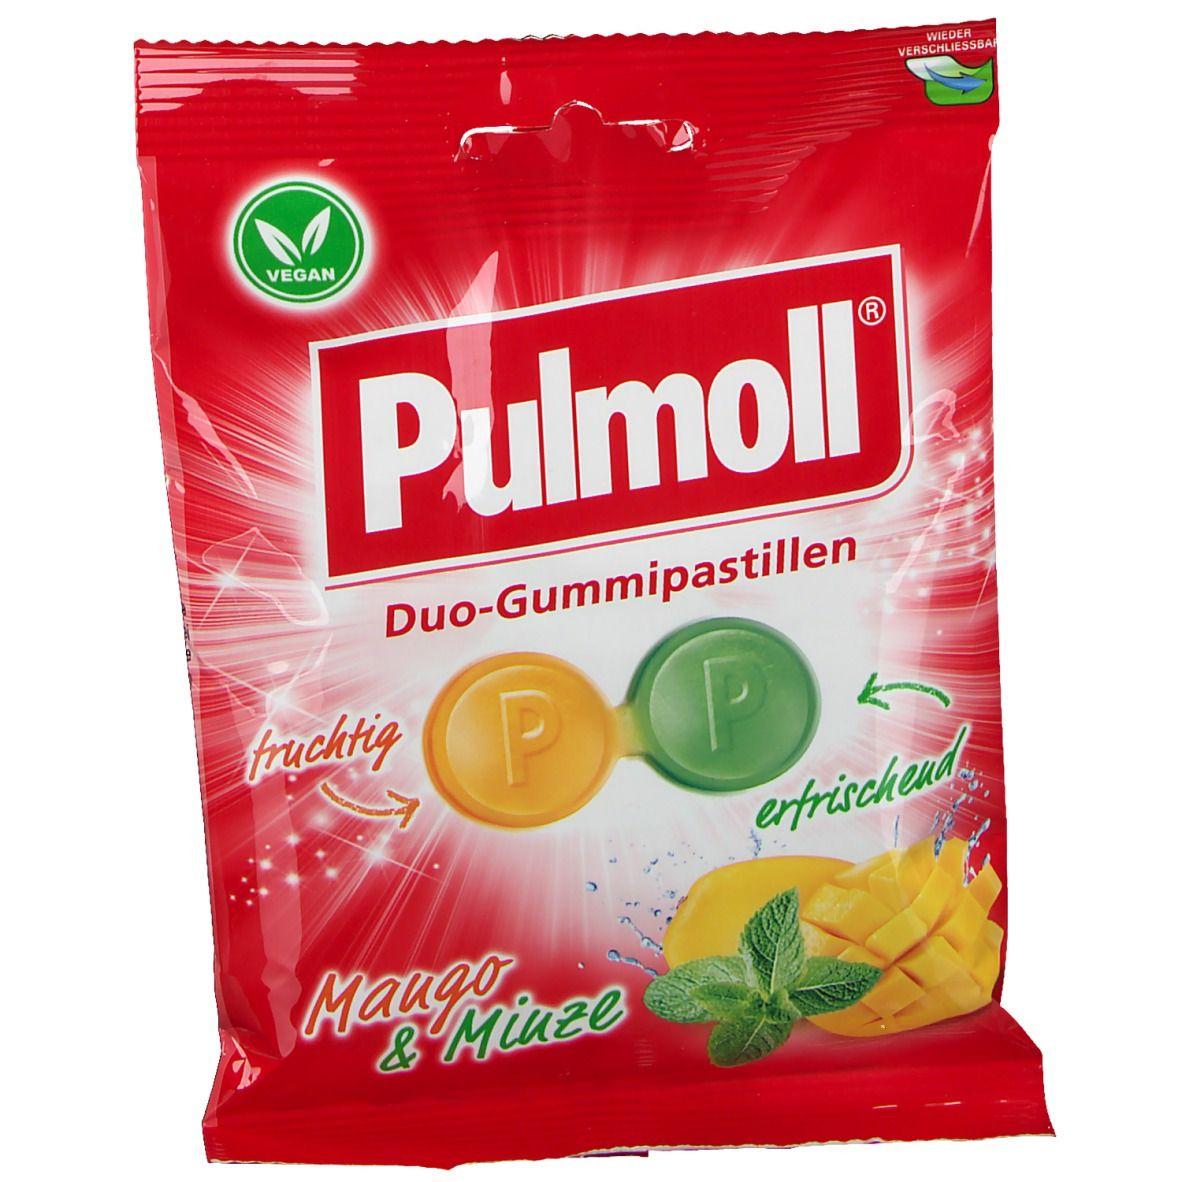 Pullmoll® Duo-Gummipastillen Mango & Minze